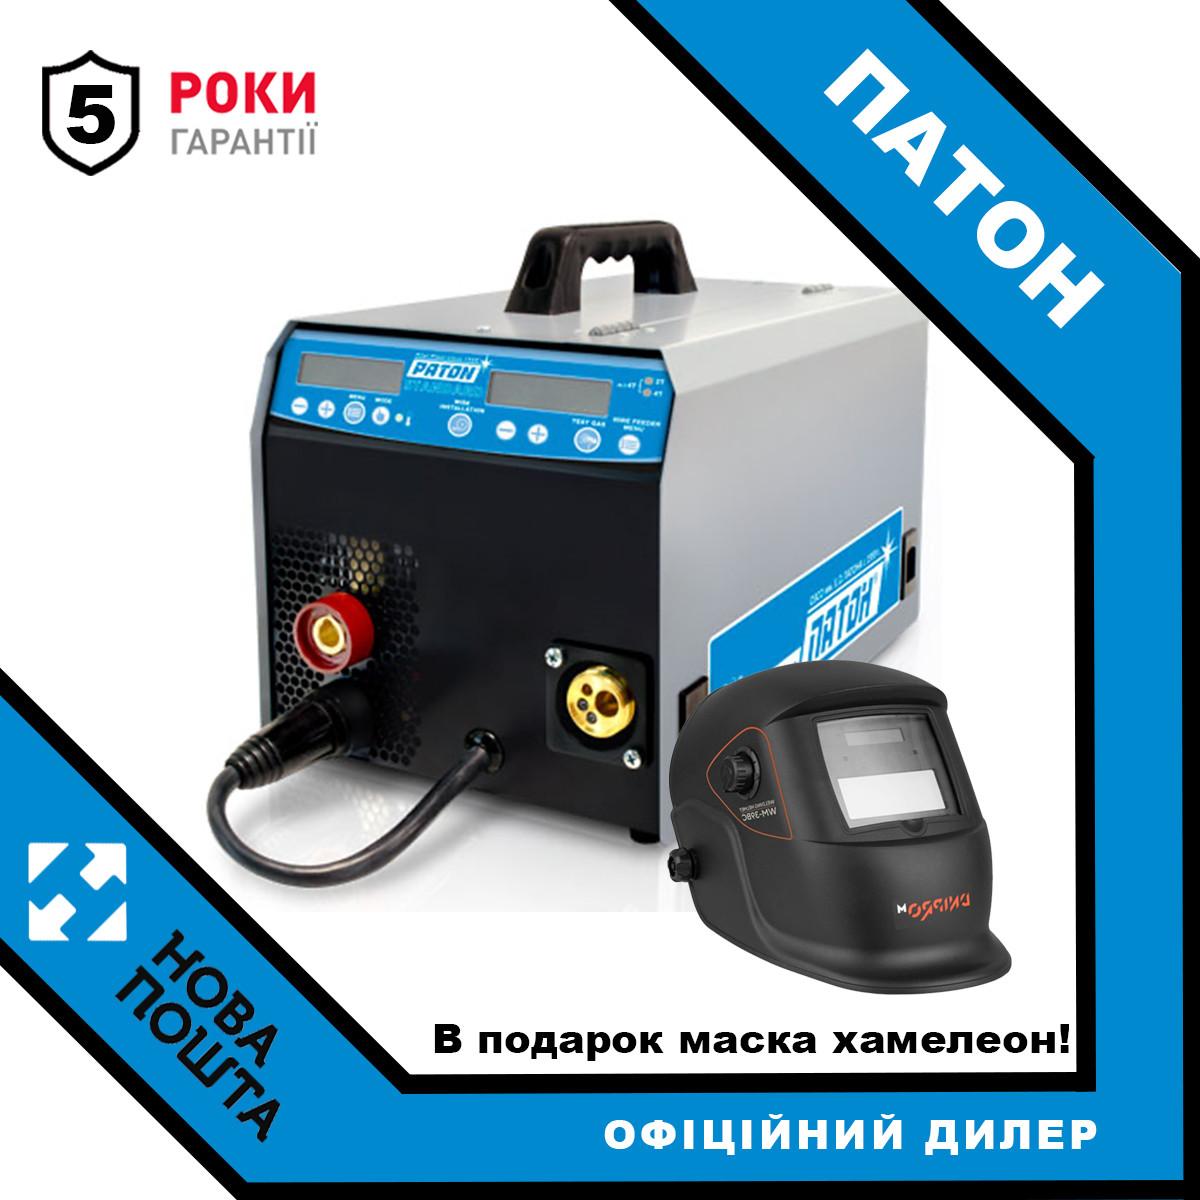 Инверторный цифровой полуавтомат Патон ПСИ-160S + маска хамелеон